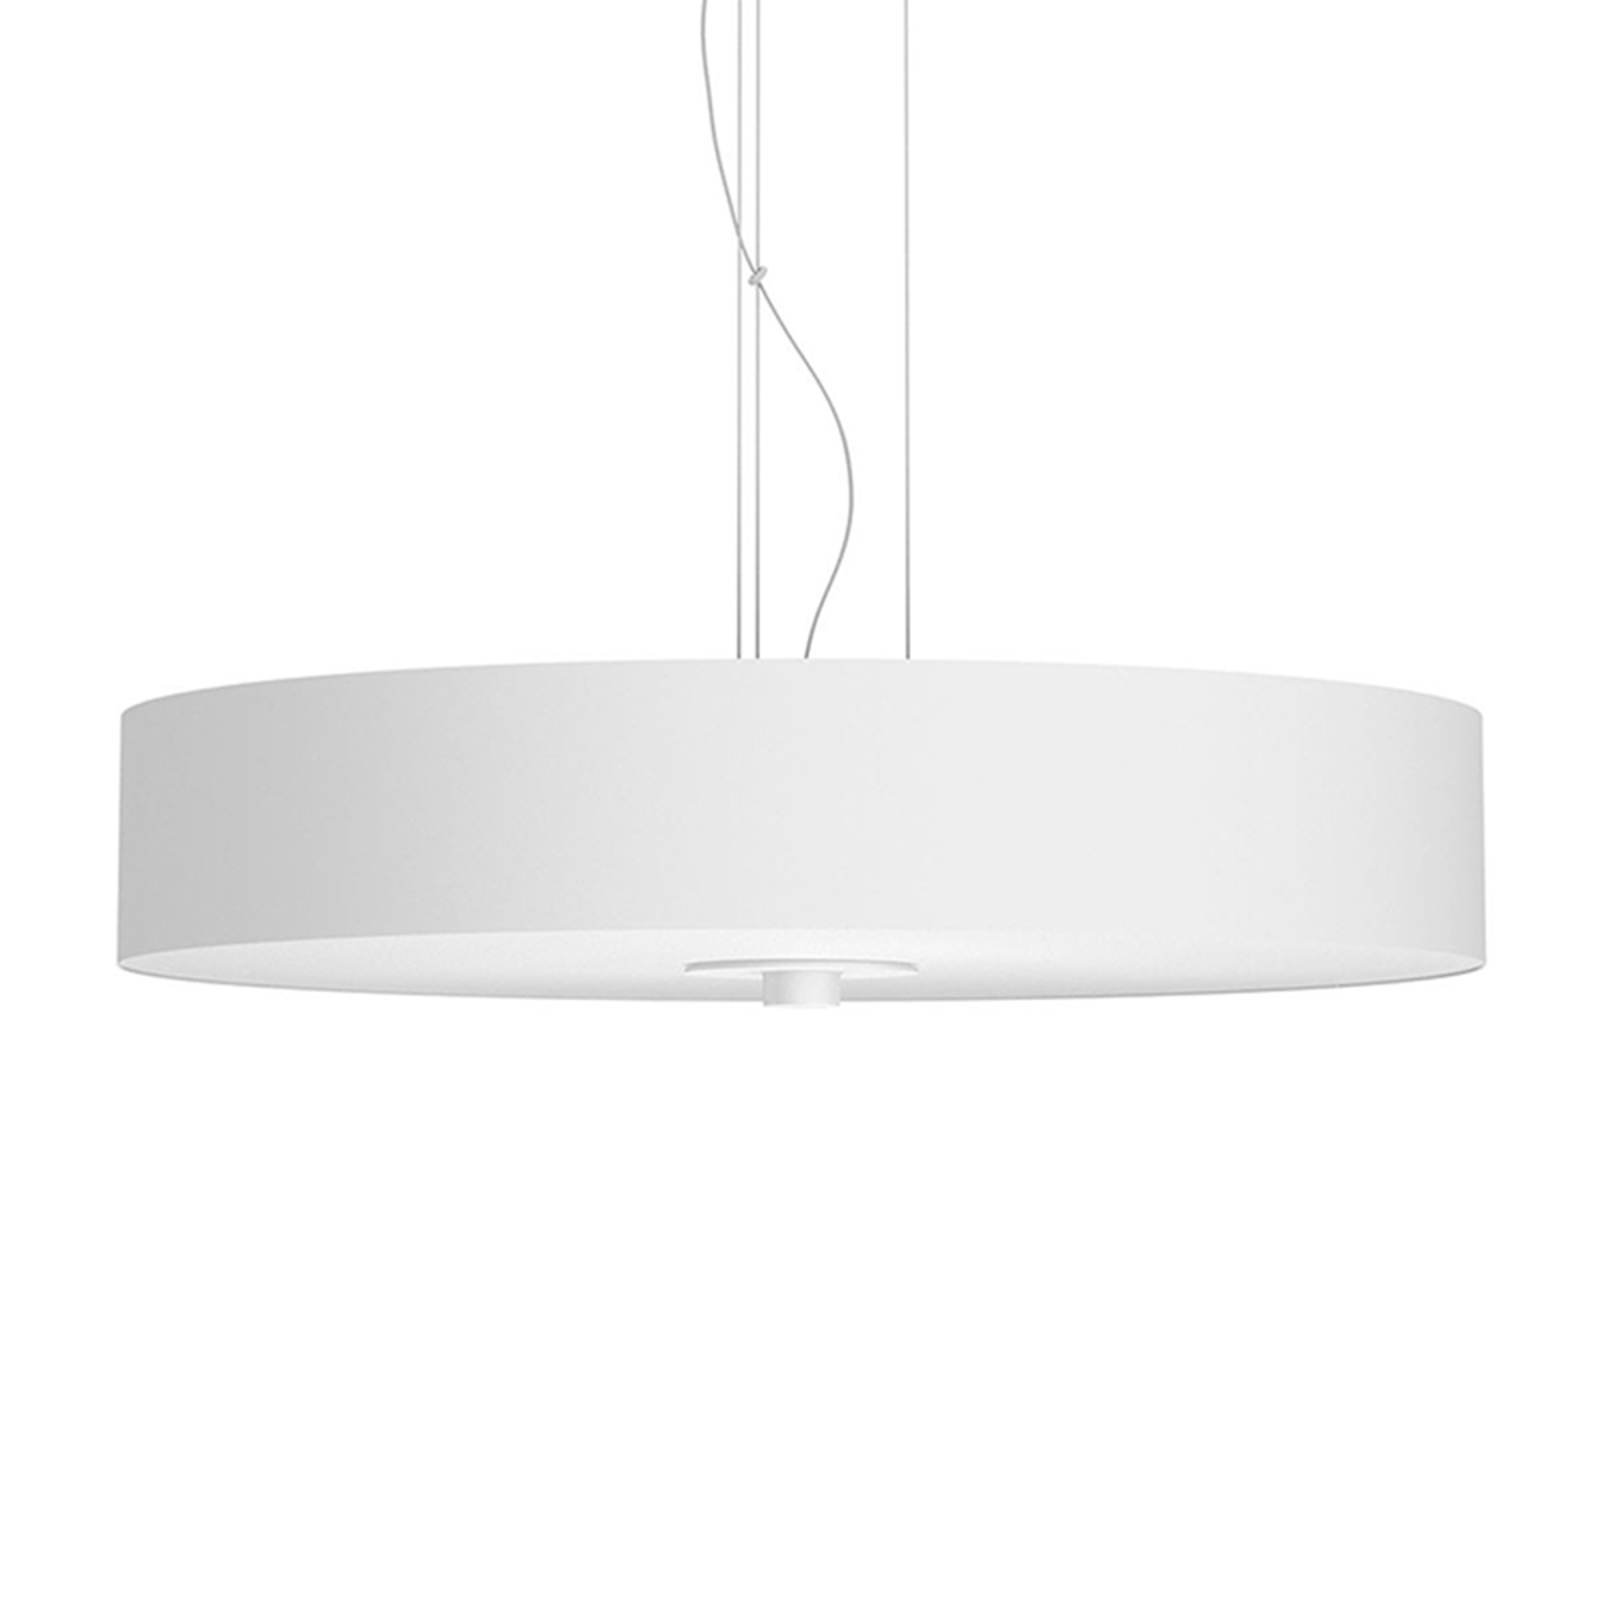 Philips Hue White Ambiance Fair pendellampe, hvit